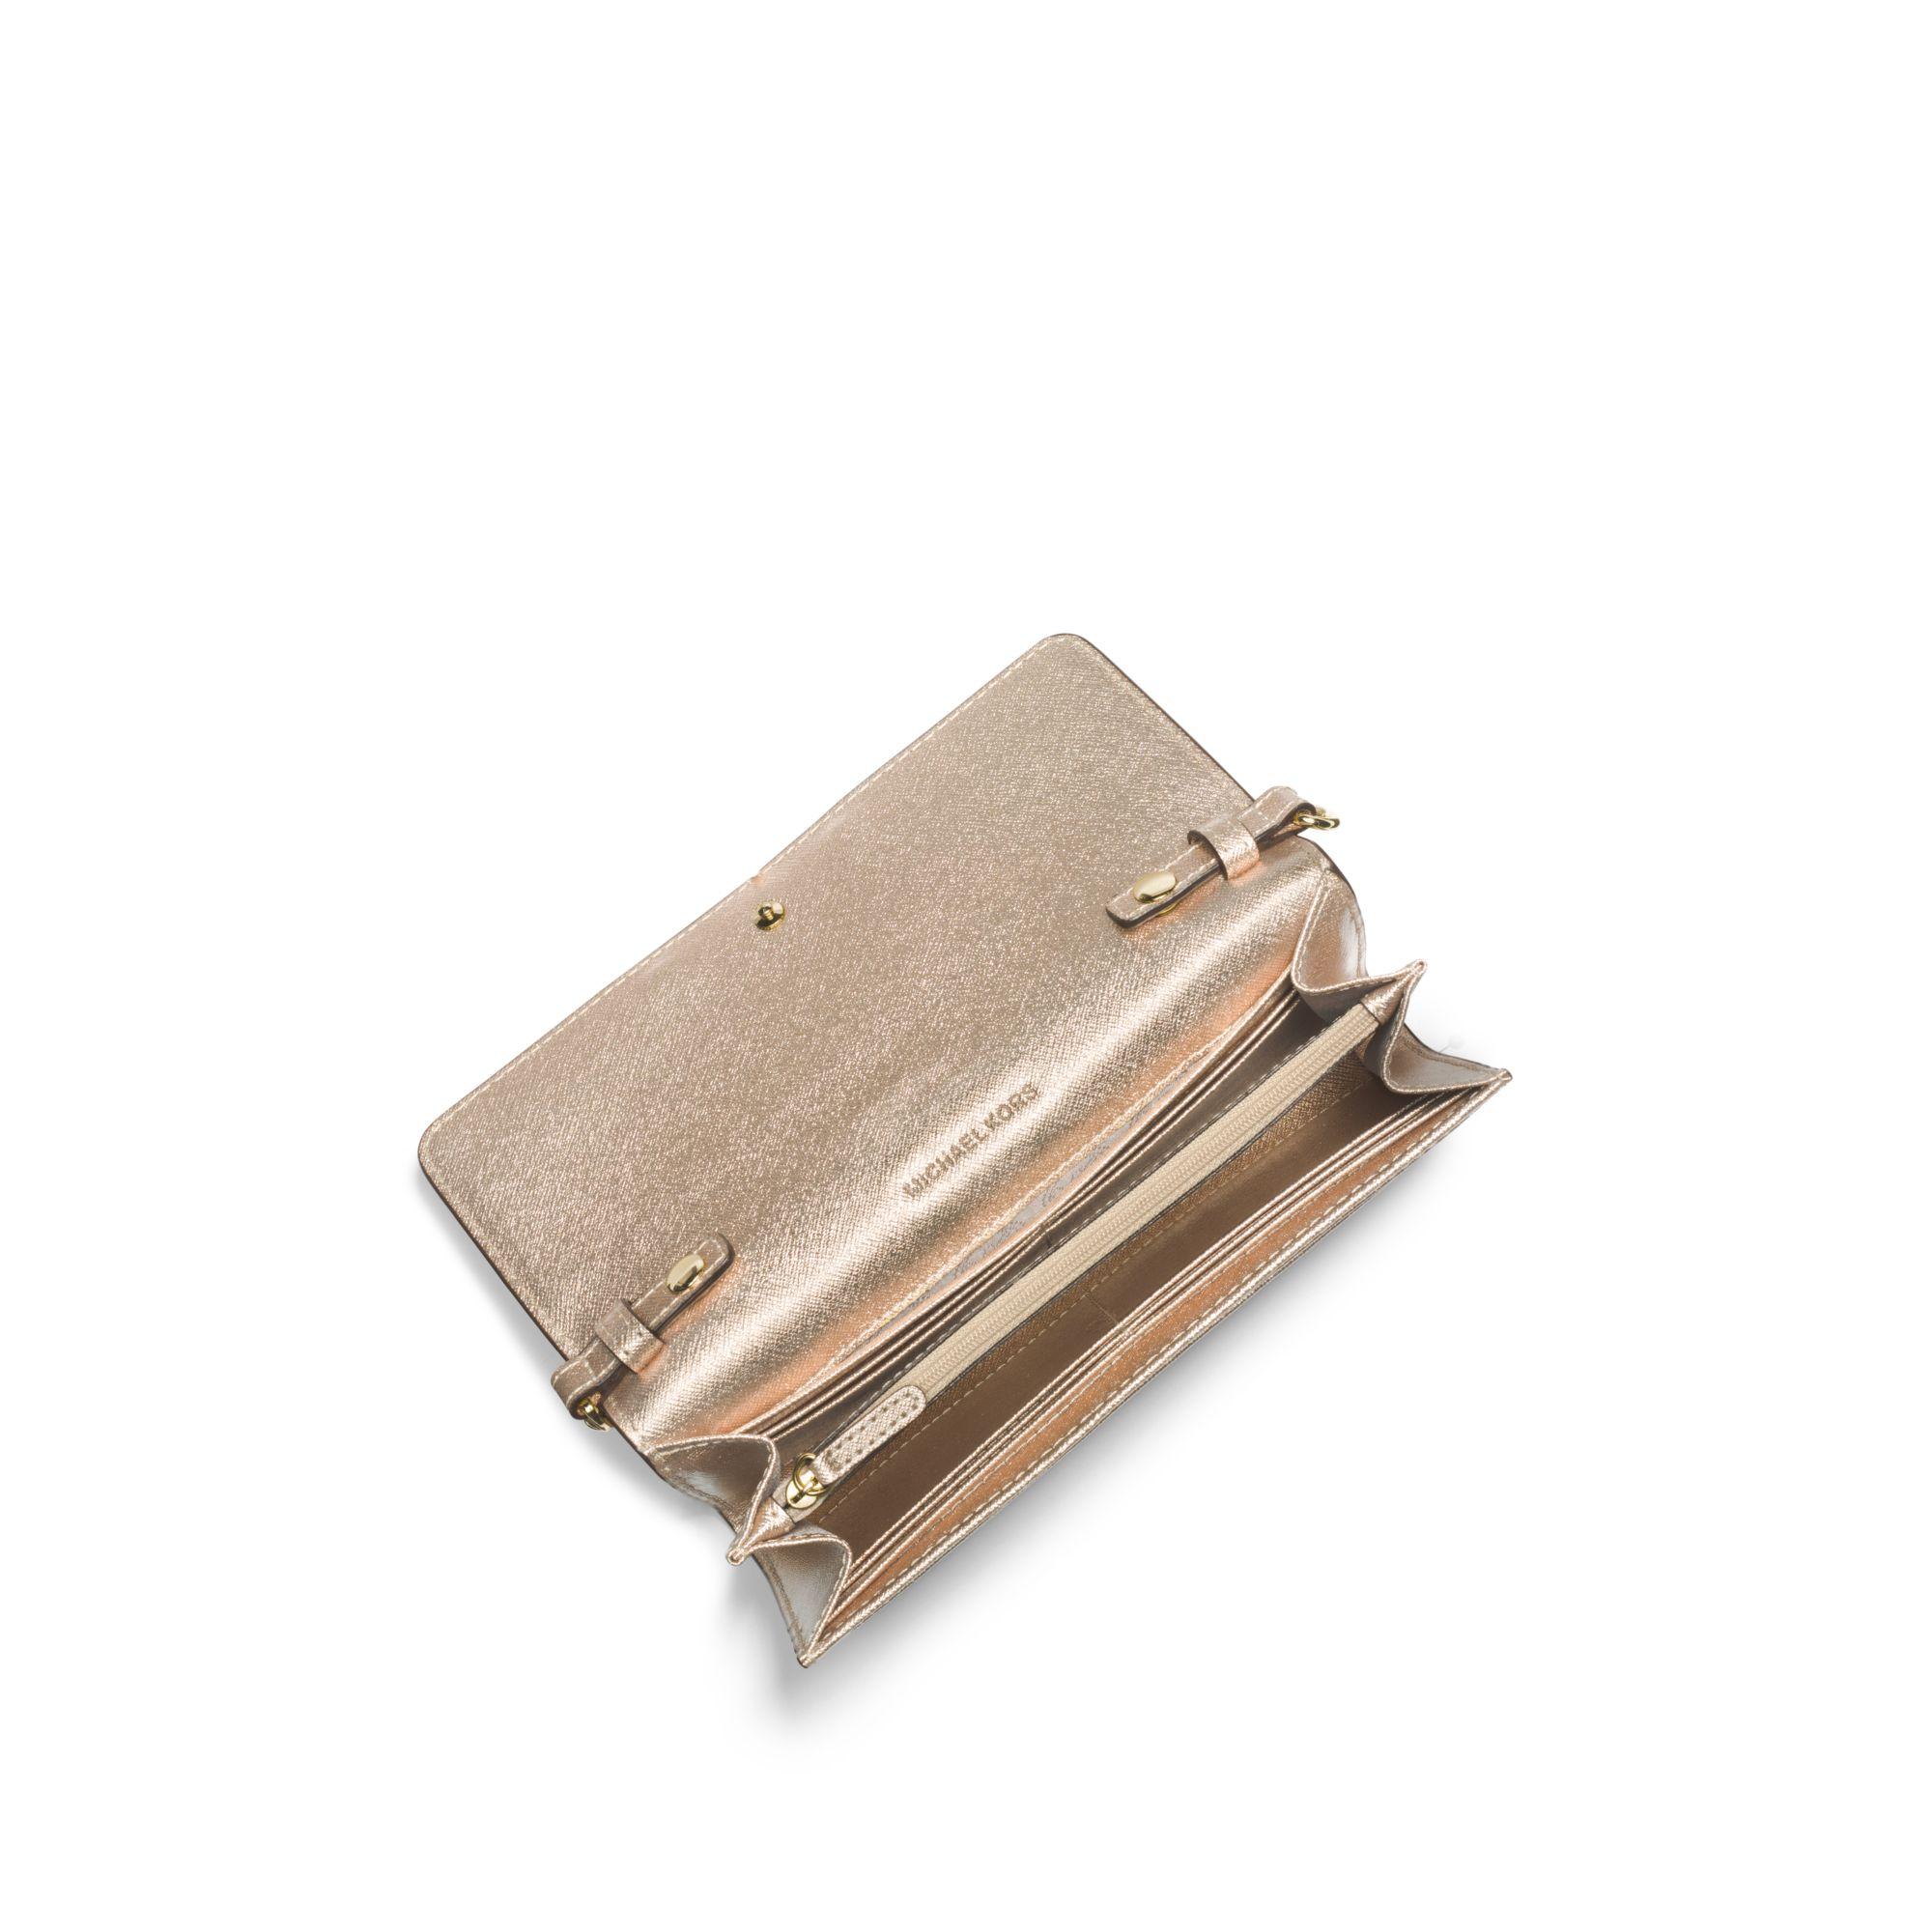 6d8bdabf9788 Michael Kors Jet Set Travel Metallic Saffiano Leather Chain Wallet ...